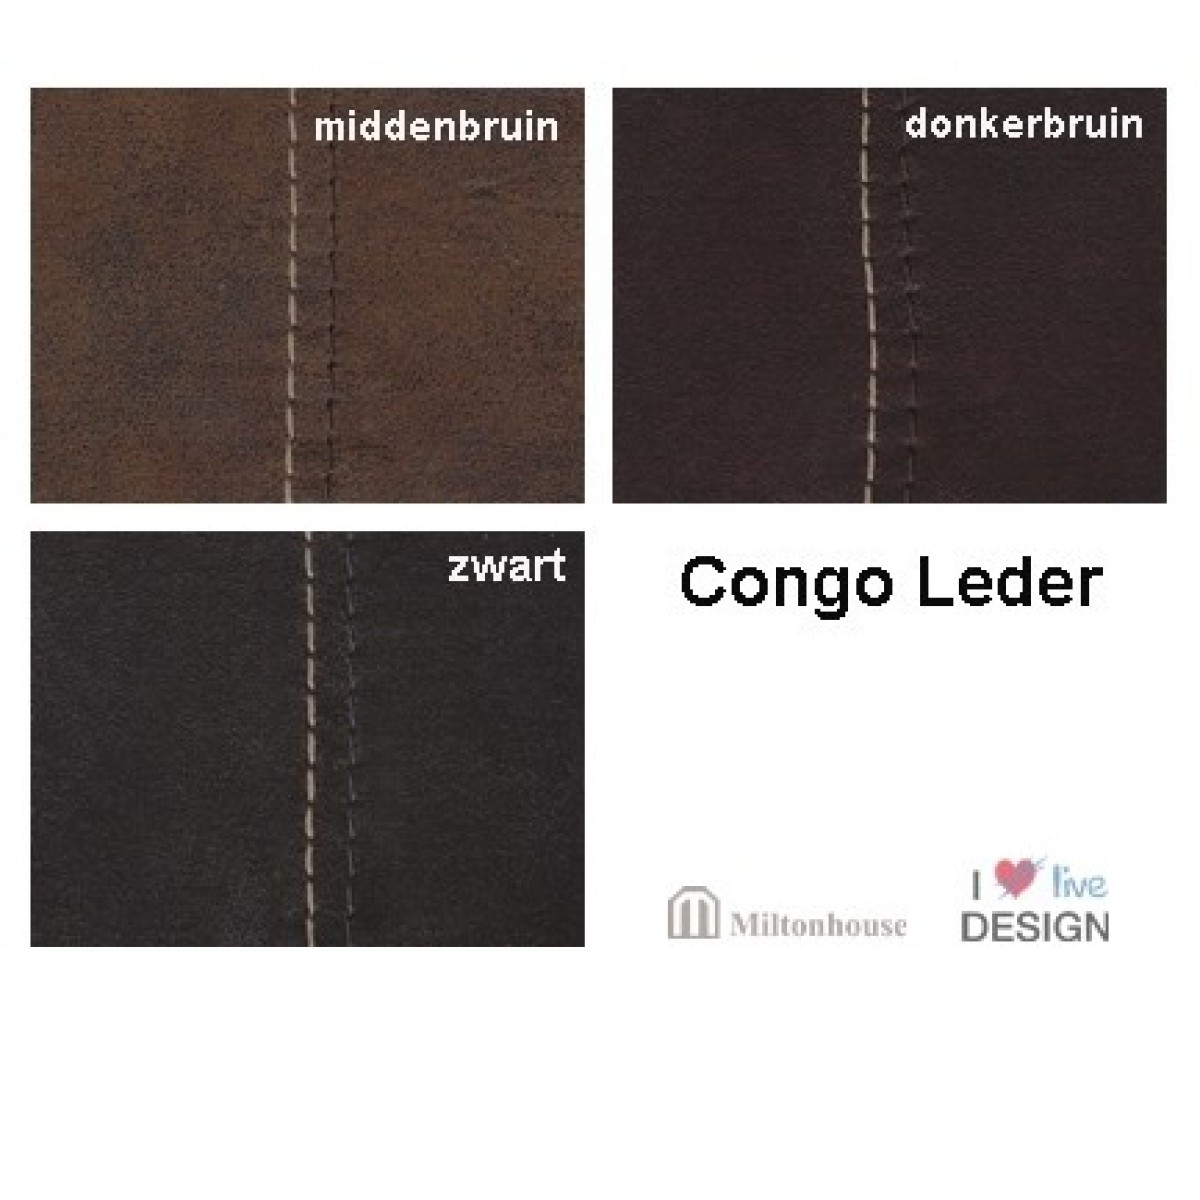 cong-kongo-leder-l60-het-anker